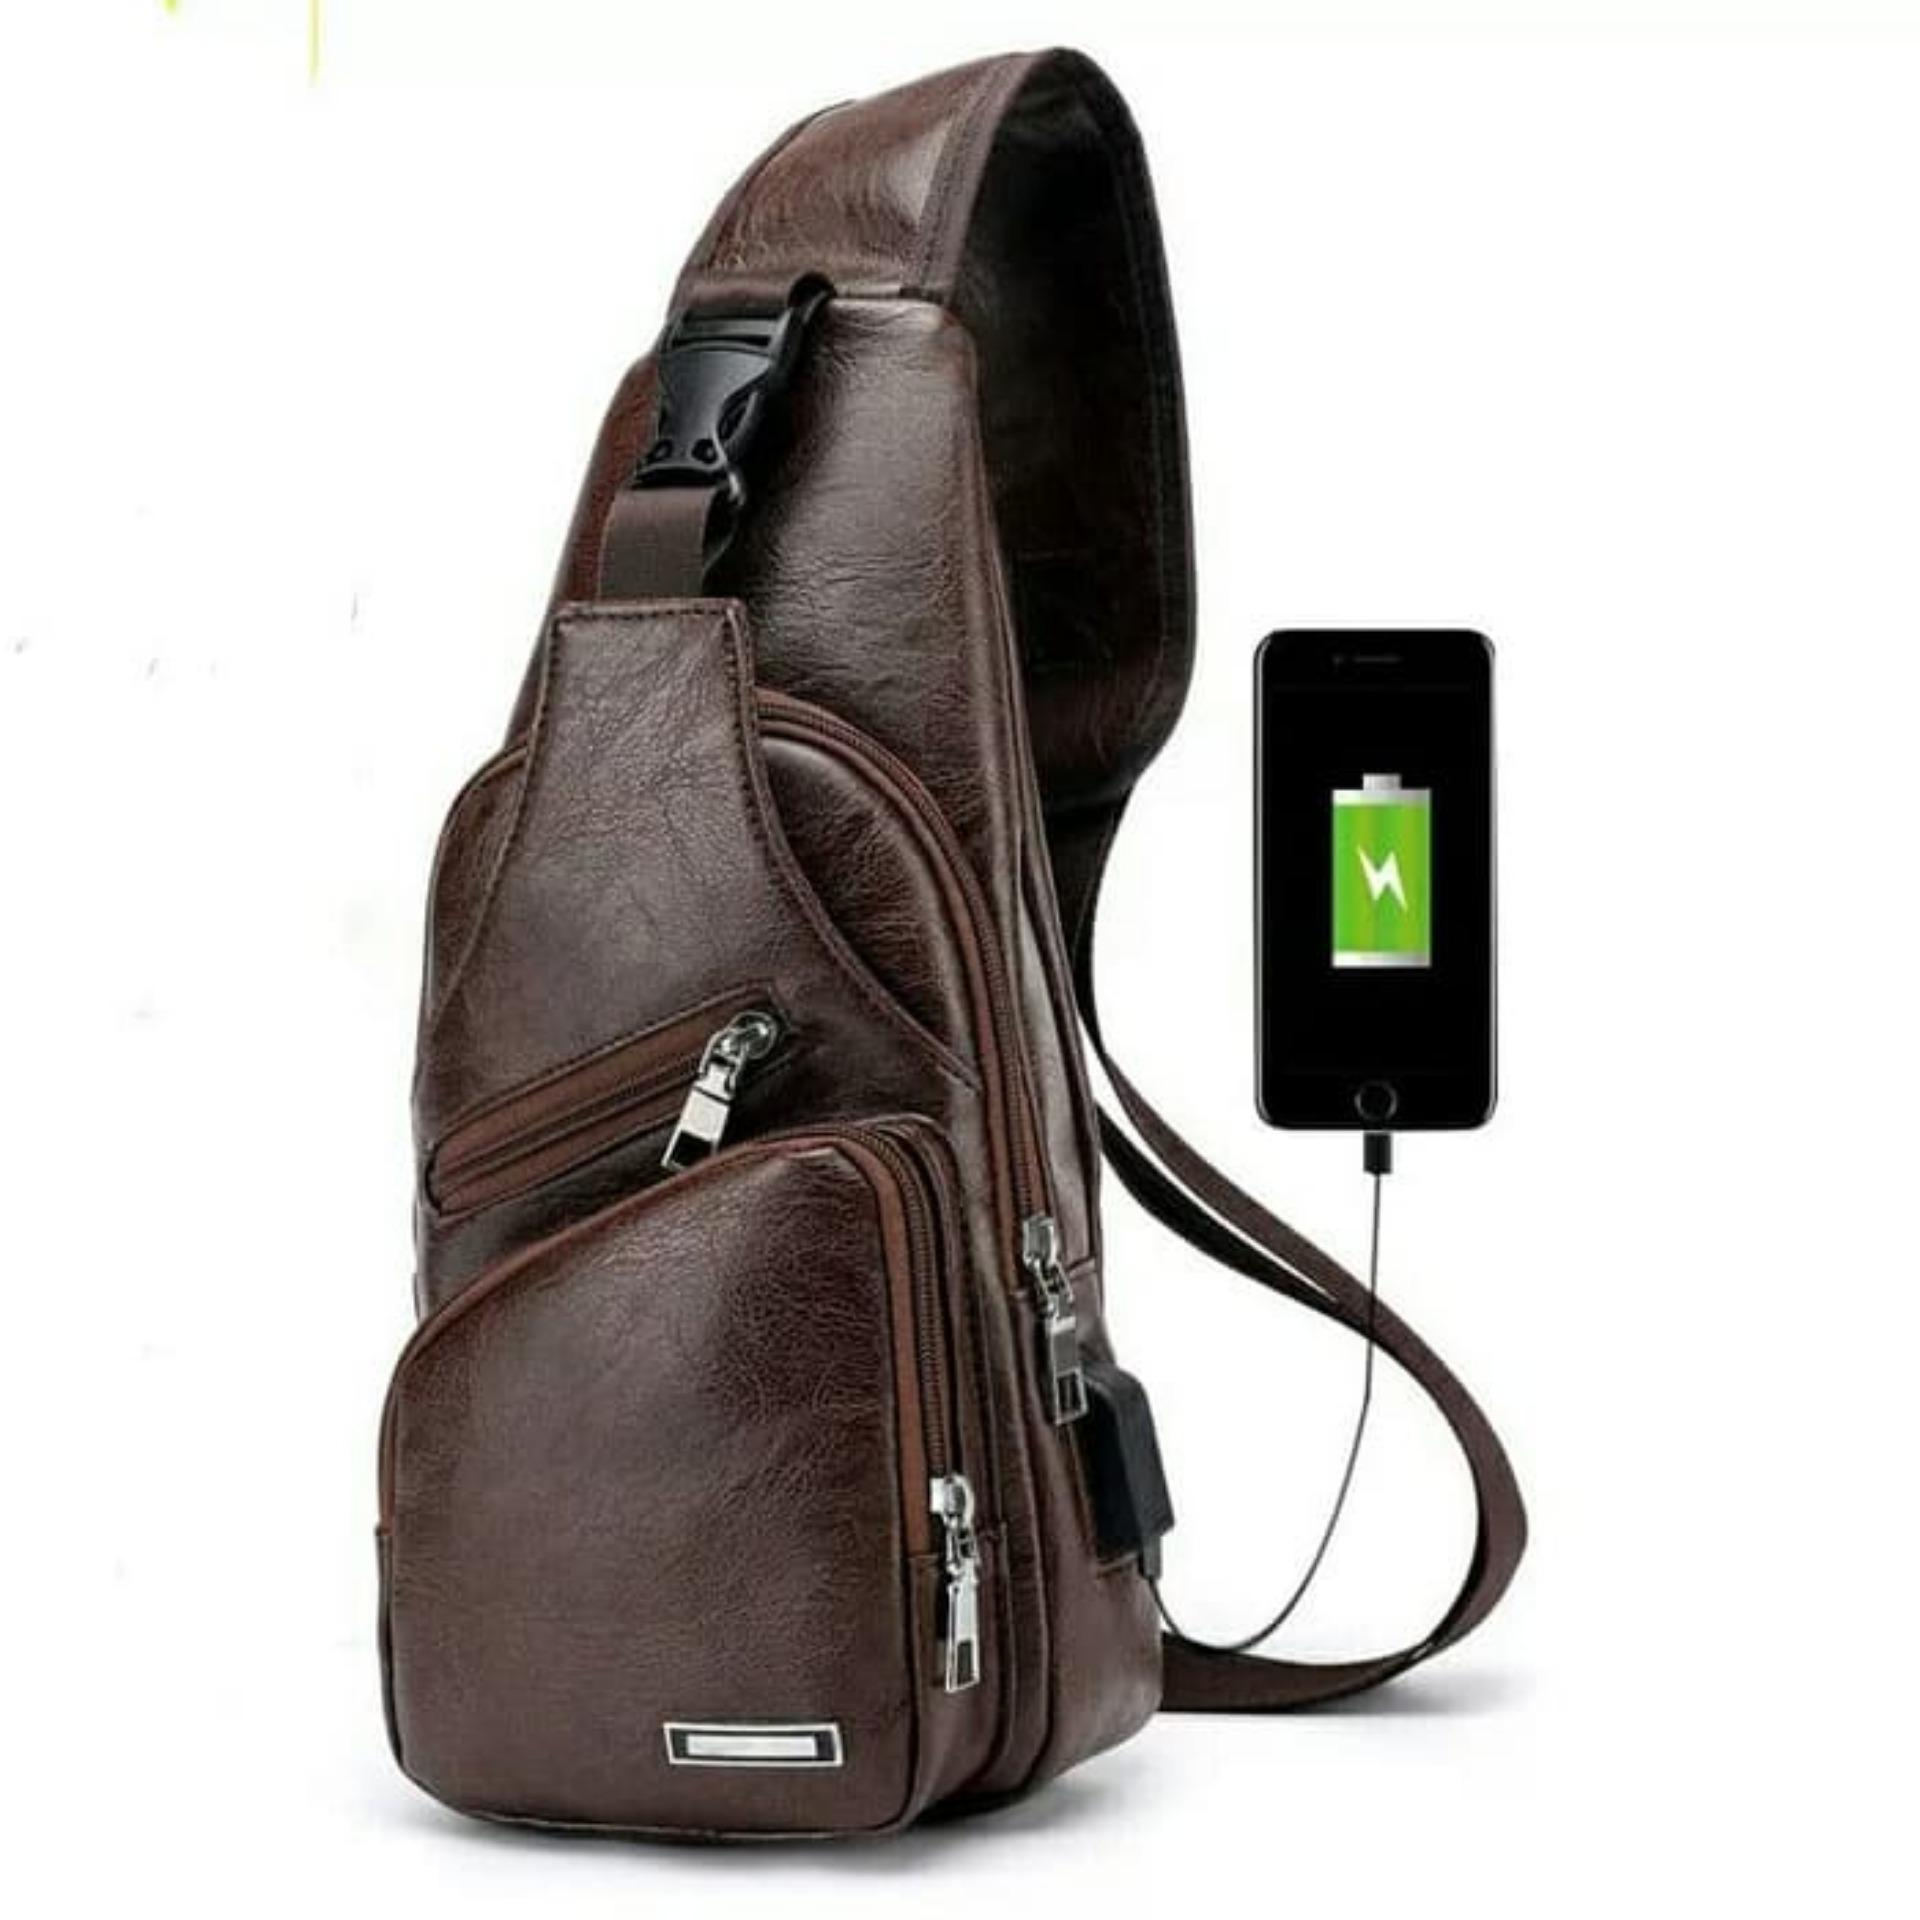 Tas Selempang NEW KULIT Pria Sling Bag Kulit USB Port 487746b312